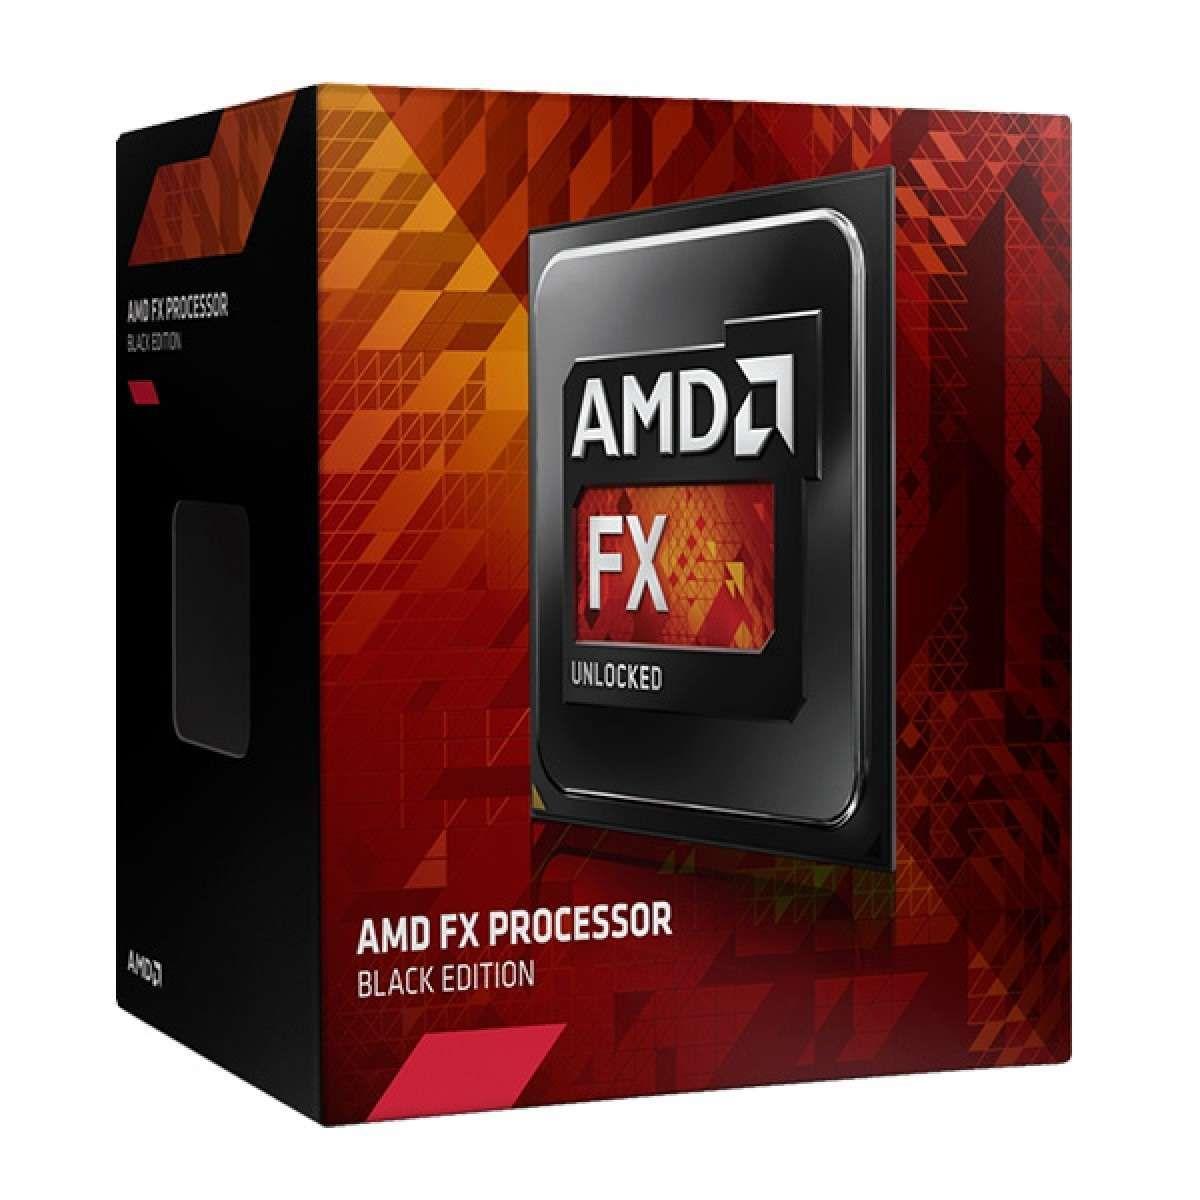 Processador AMD FX-6300, Black Edition, Cache 14MB, 3.5GHz, AM3+ FD6300WMHKBOX